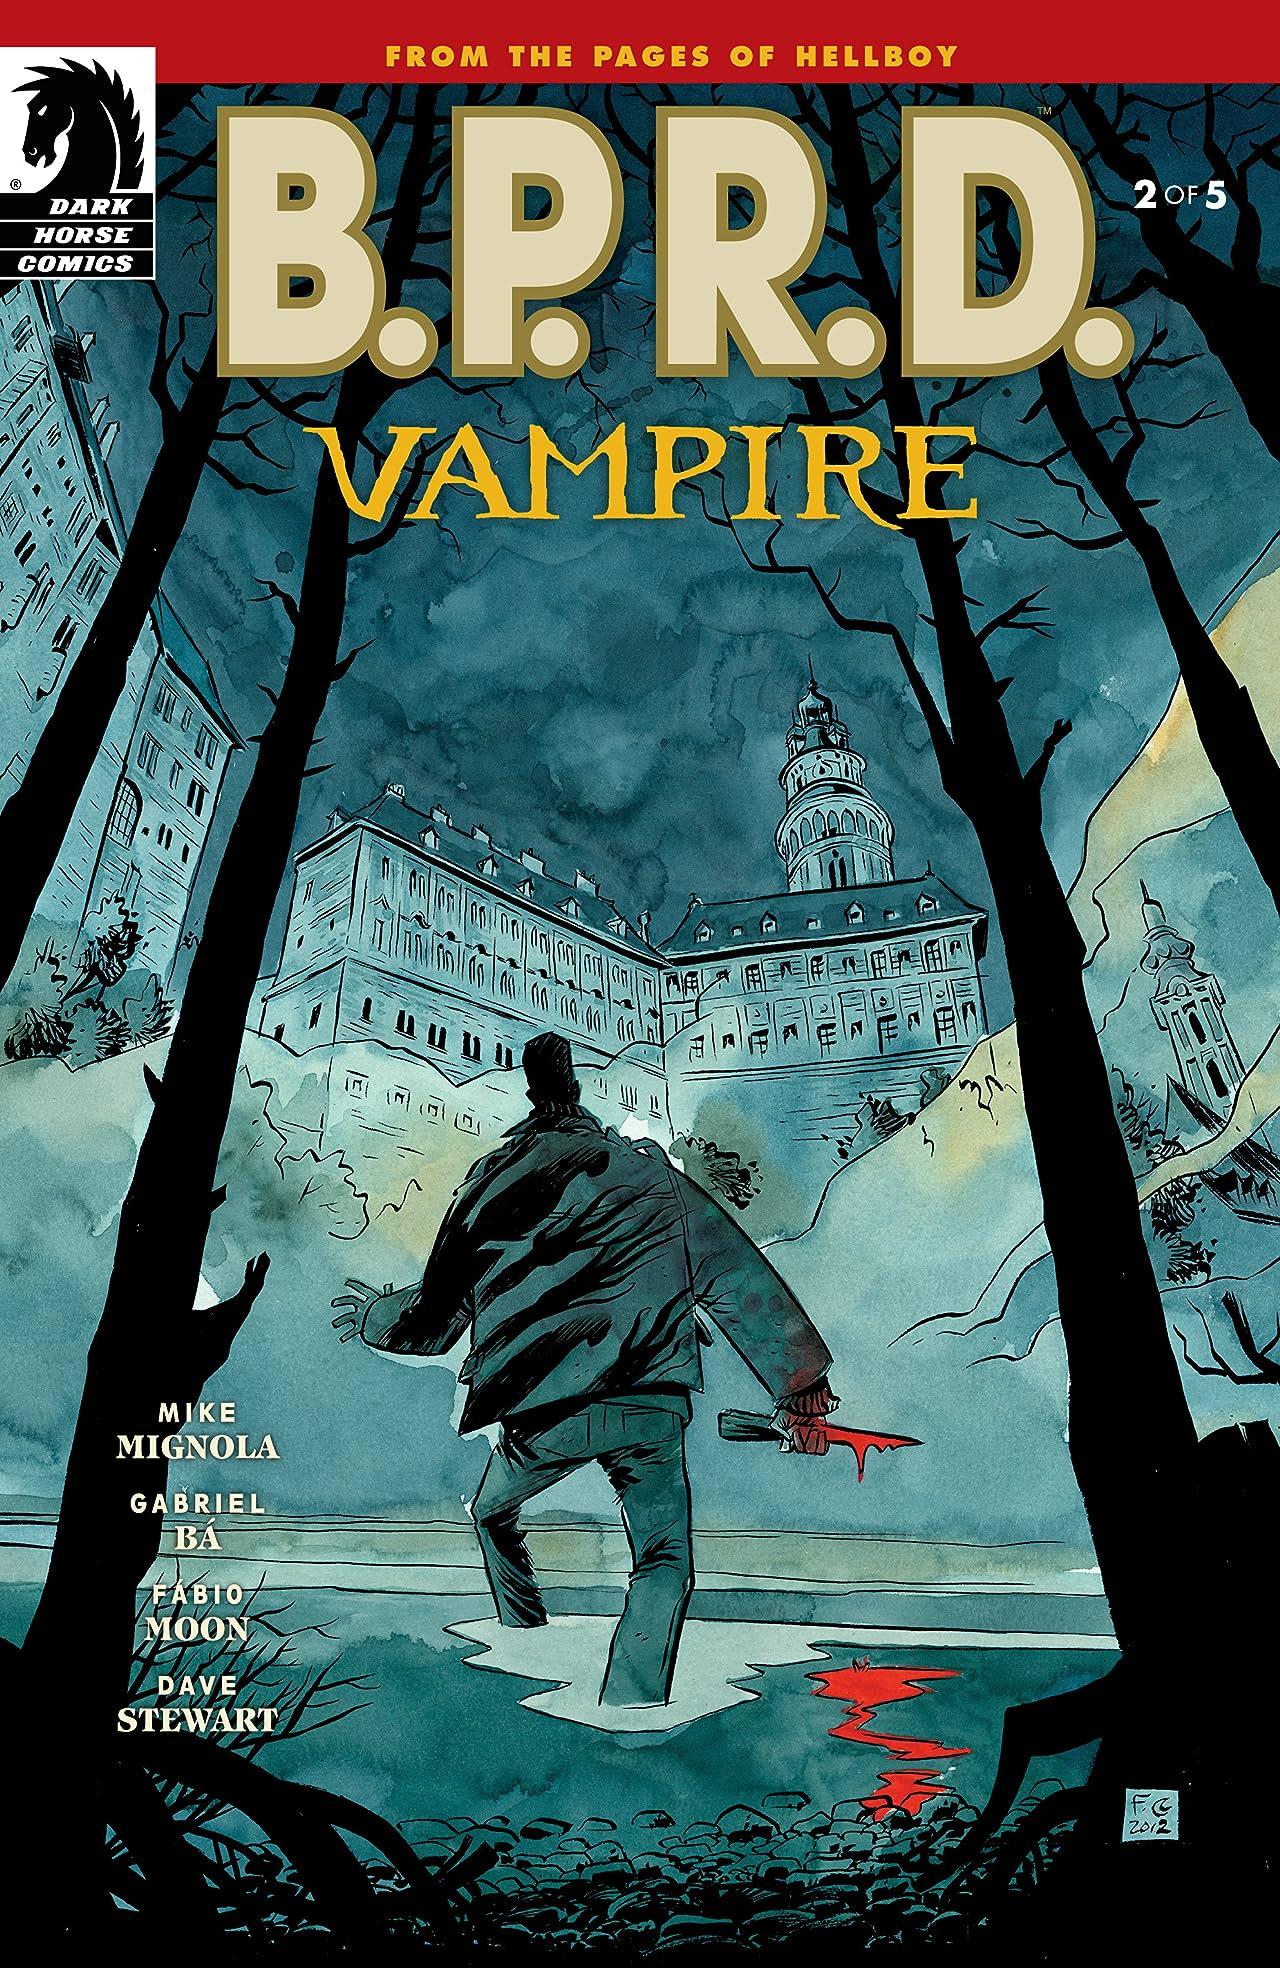 B.P.R.D.: Vampire #2